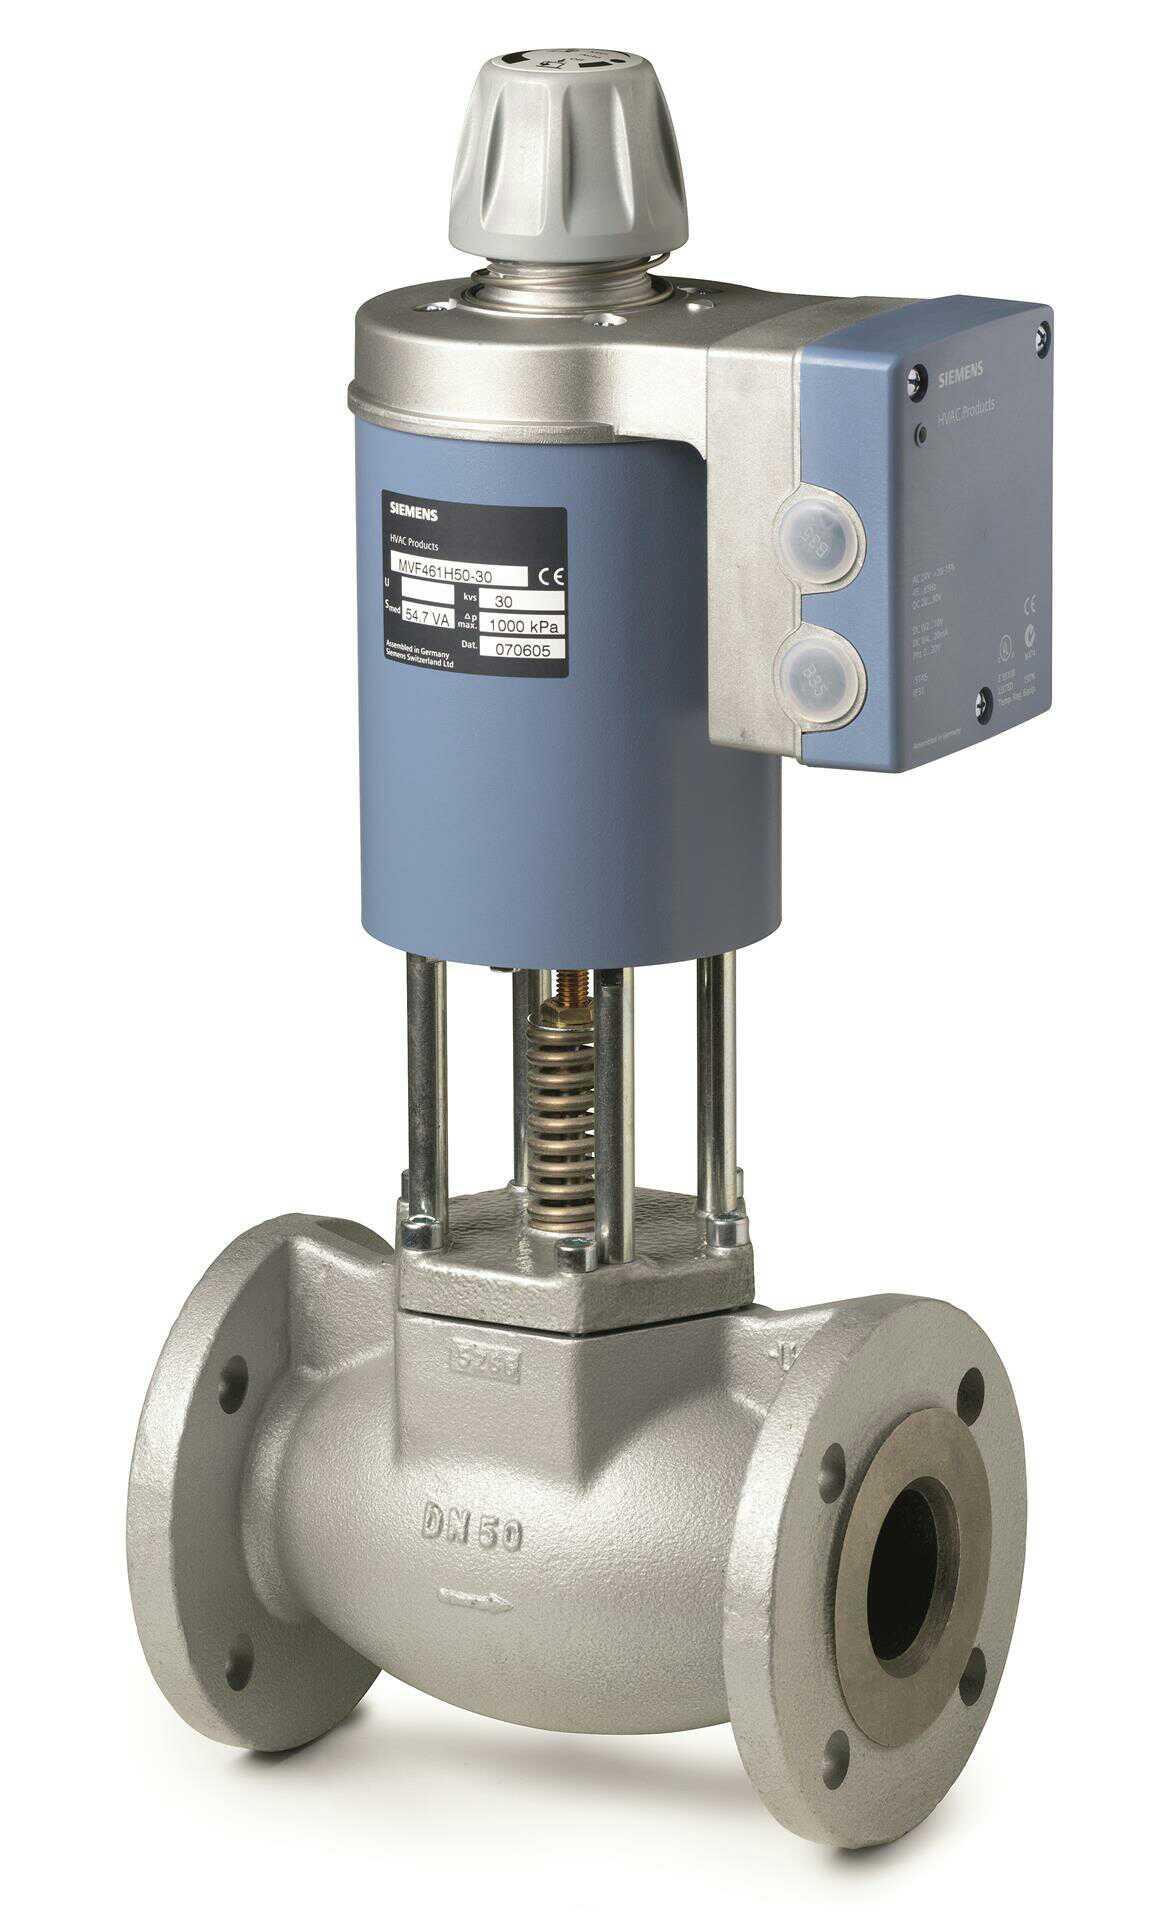 Siemens Siemens MVF461H25-8 vapor válvula eletromagnética 2 vias DN25 flange 1.